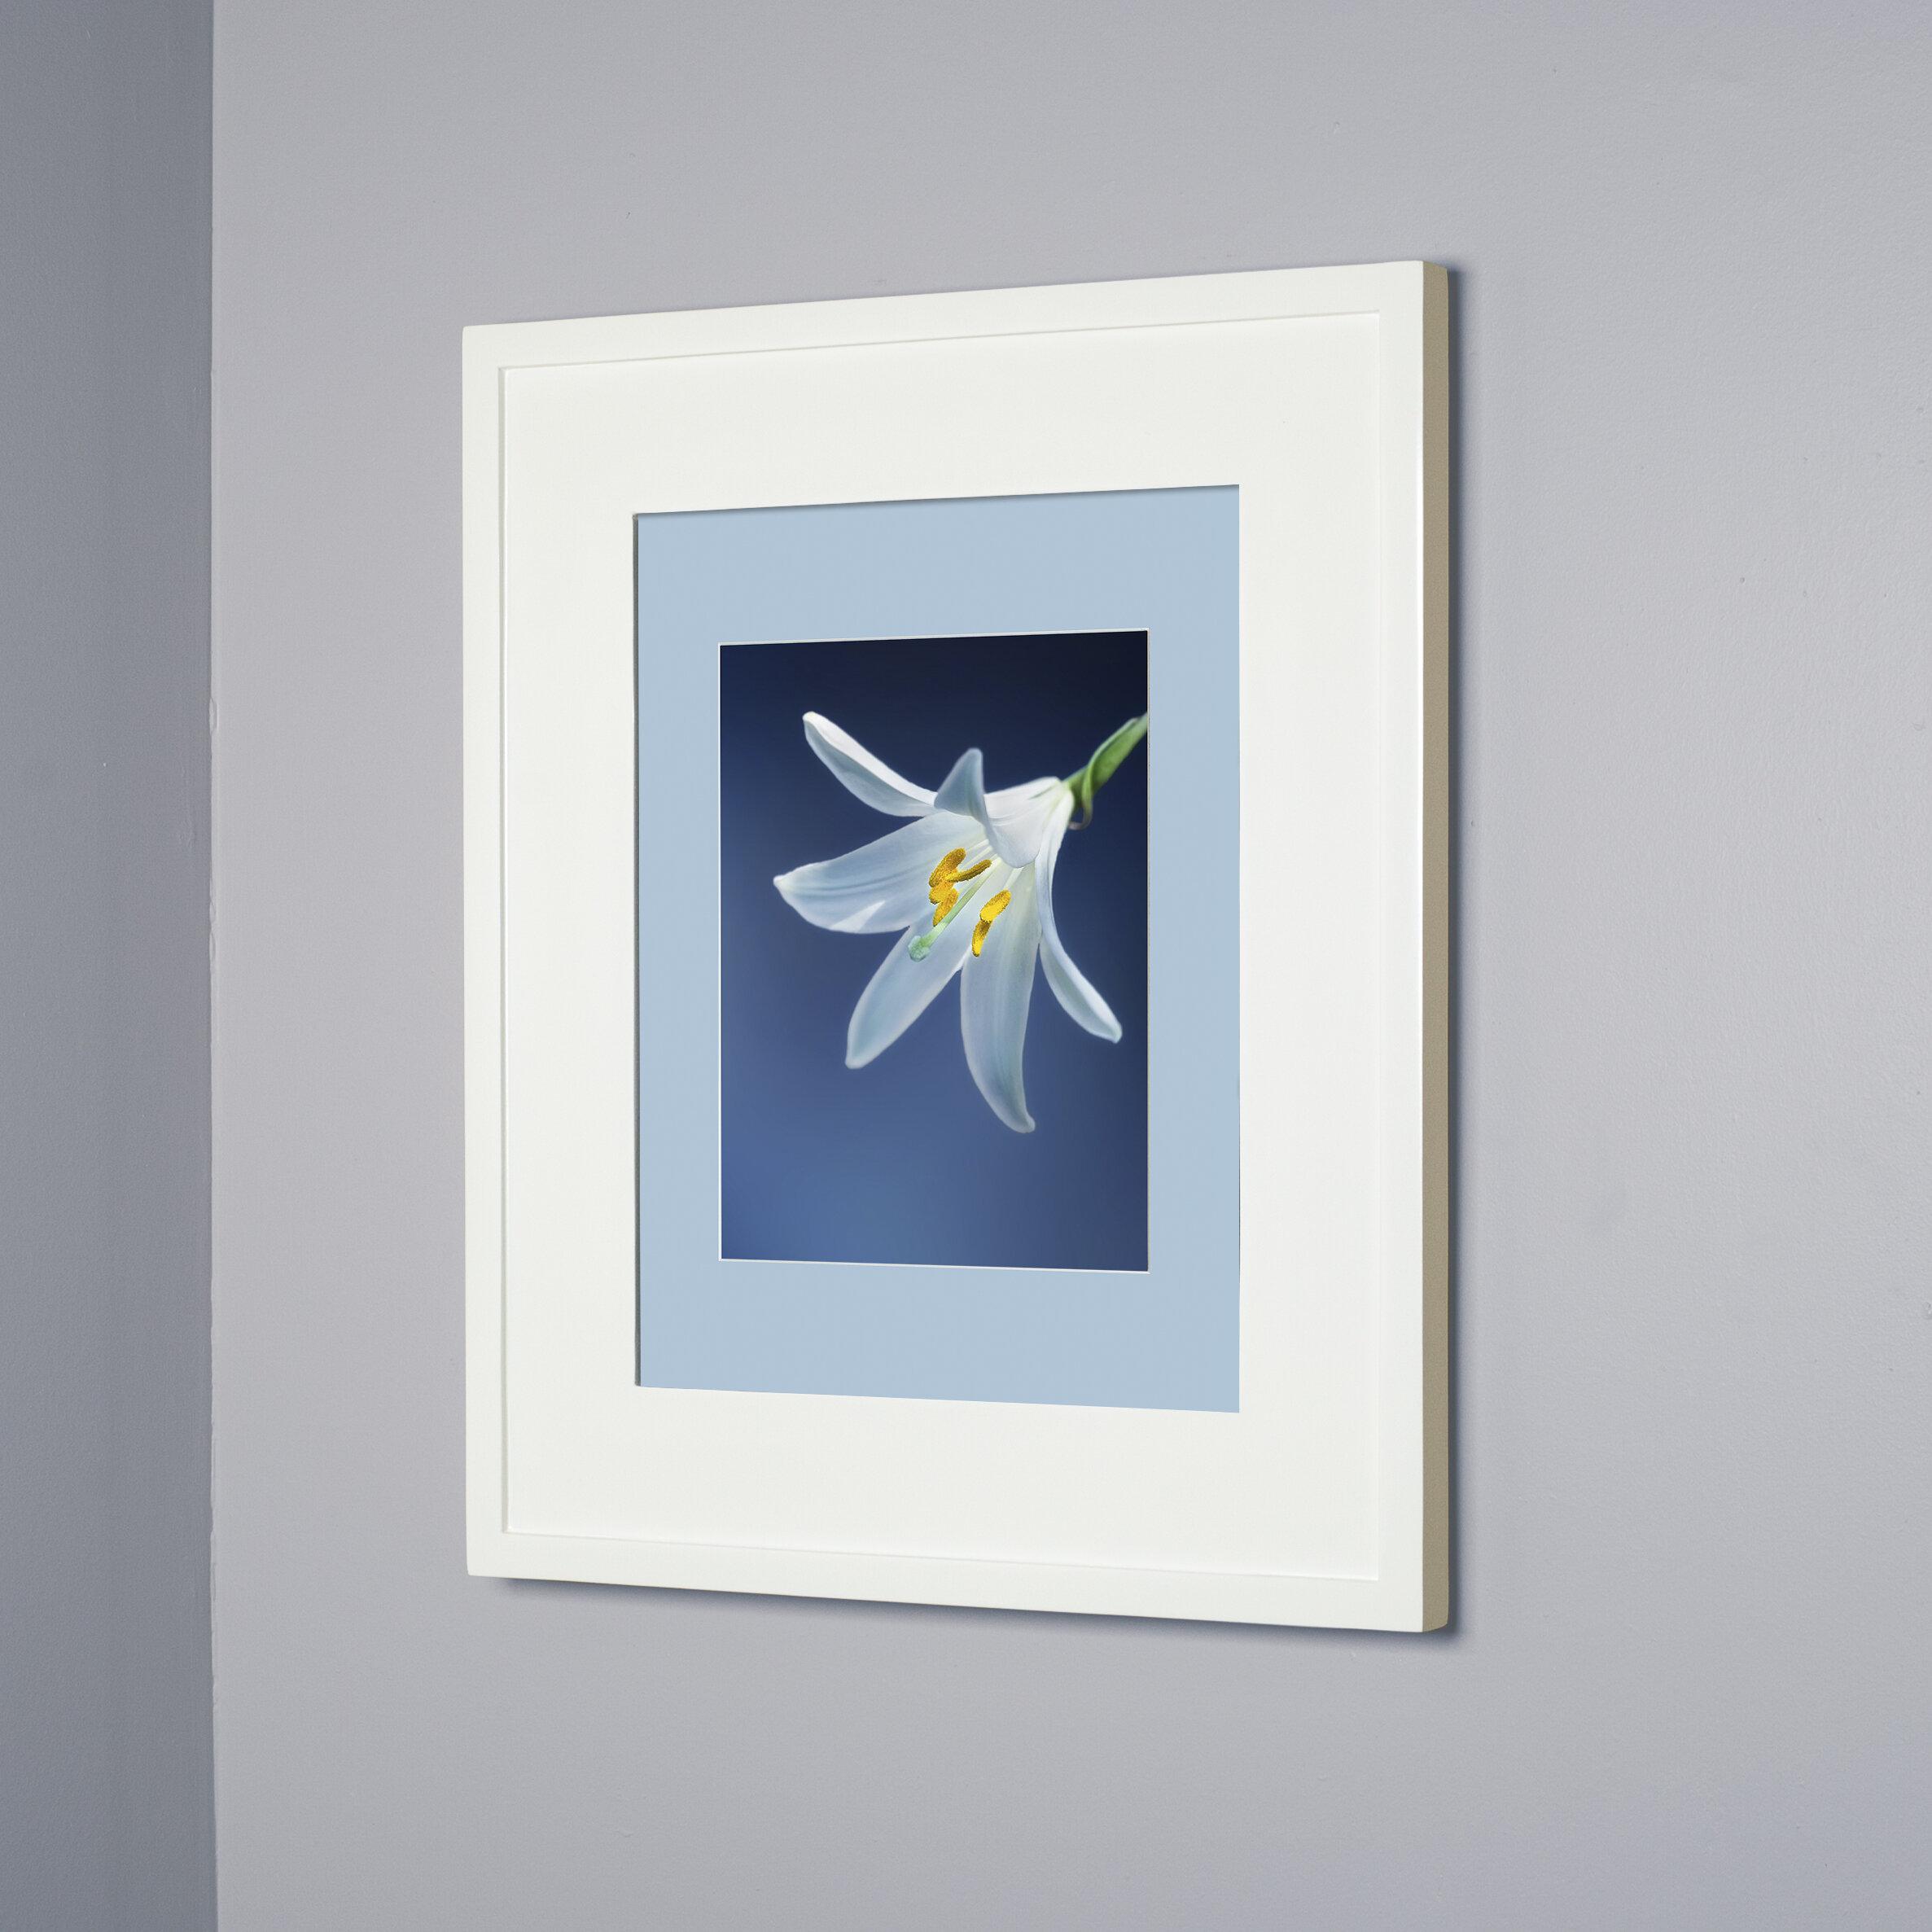 Nett 13 X 16 Picture Frame Bilder Bilderrahmen Ideen